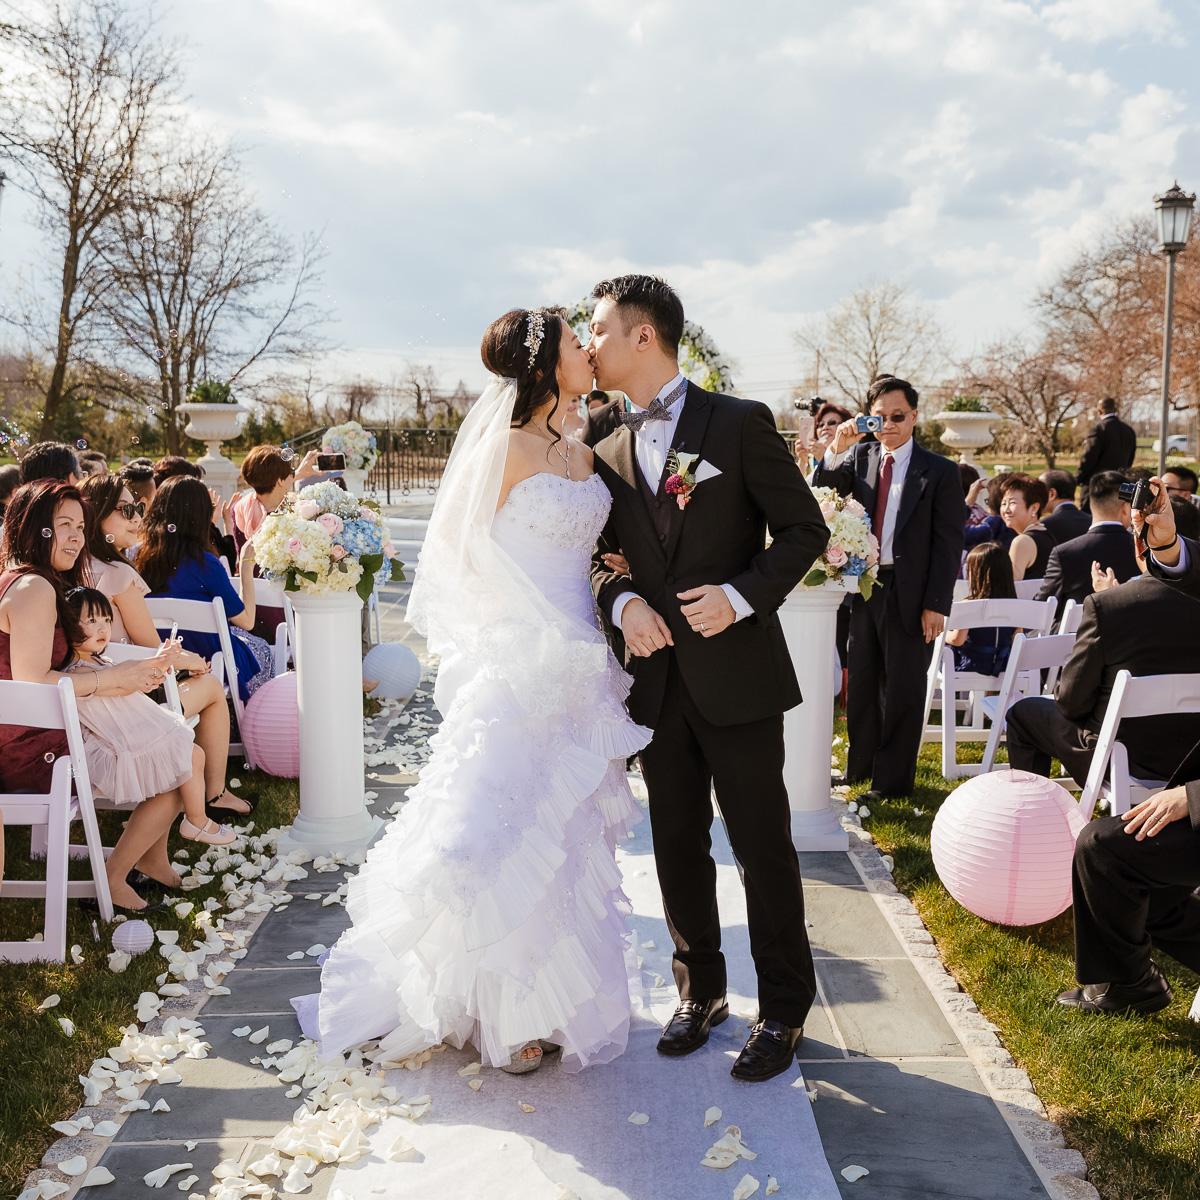 New_Jersey_Park Chateau Estate_wedding_photography_Peter_Rigo_Photography___93_web-2.jpg